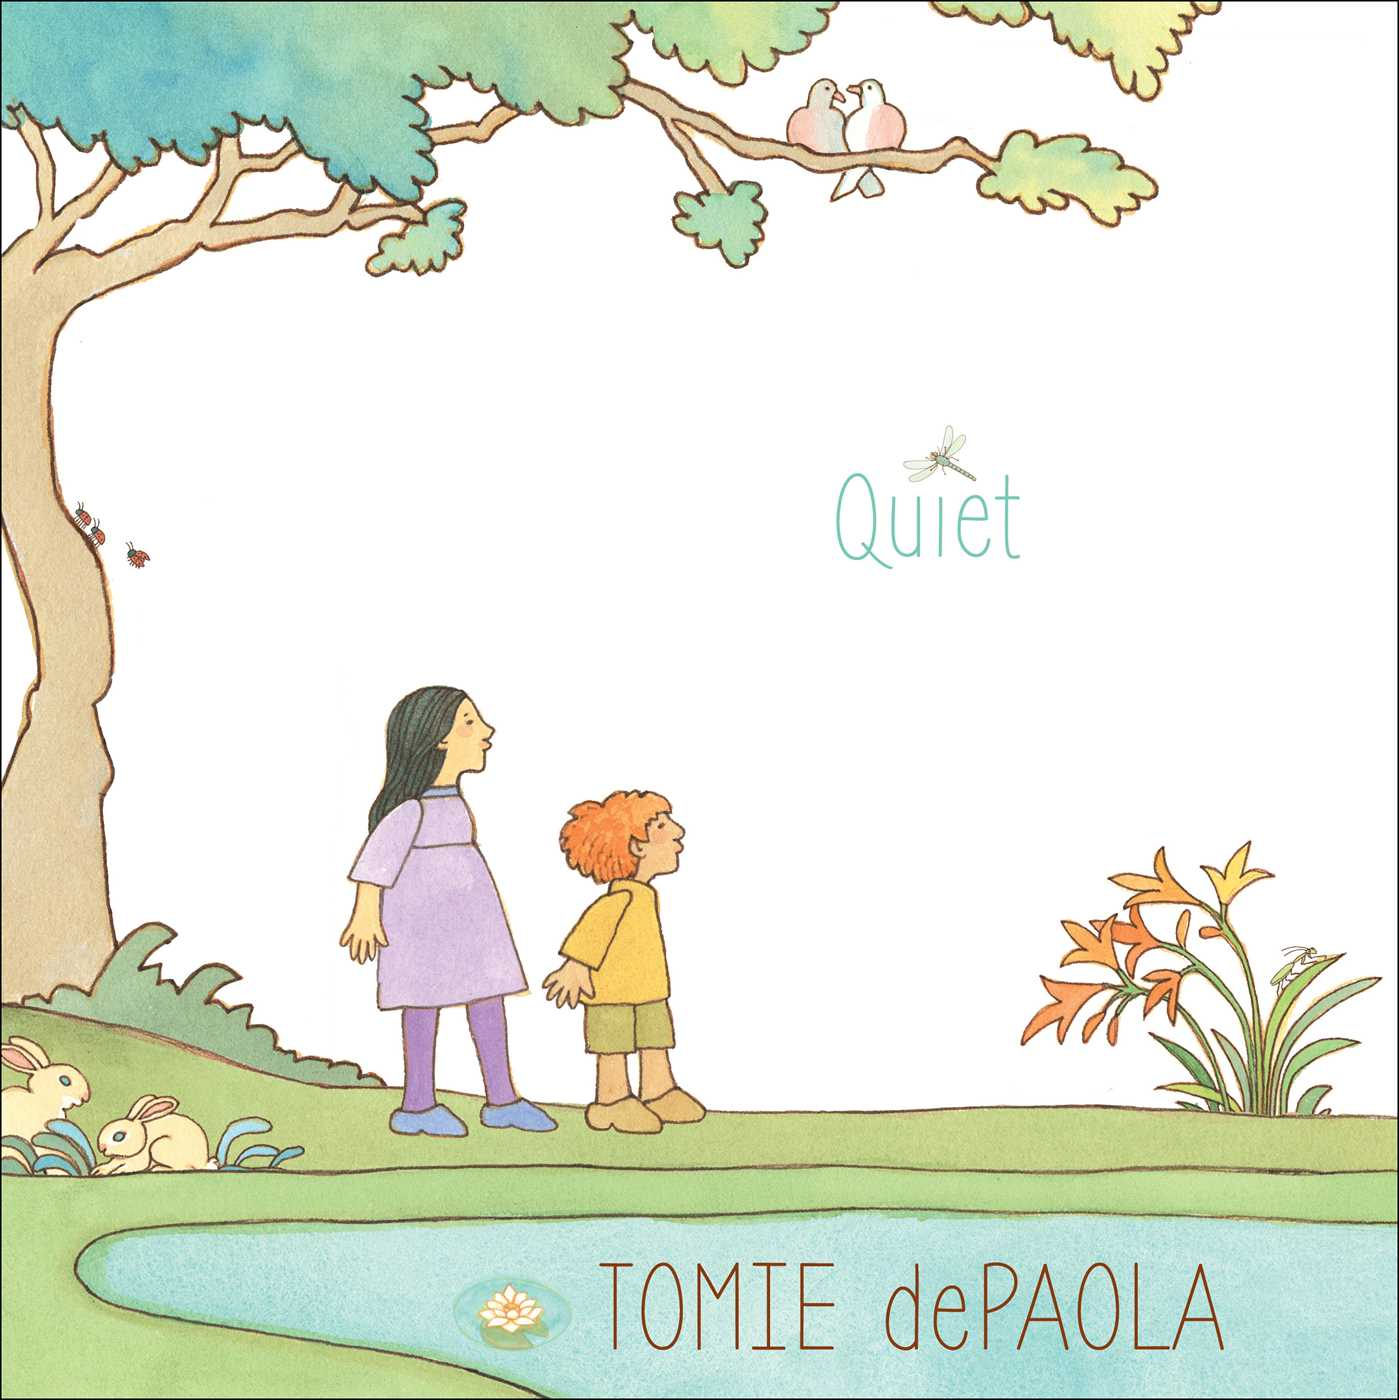 Quiet 9781481477543 hr